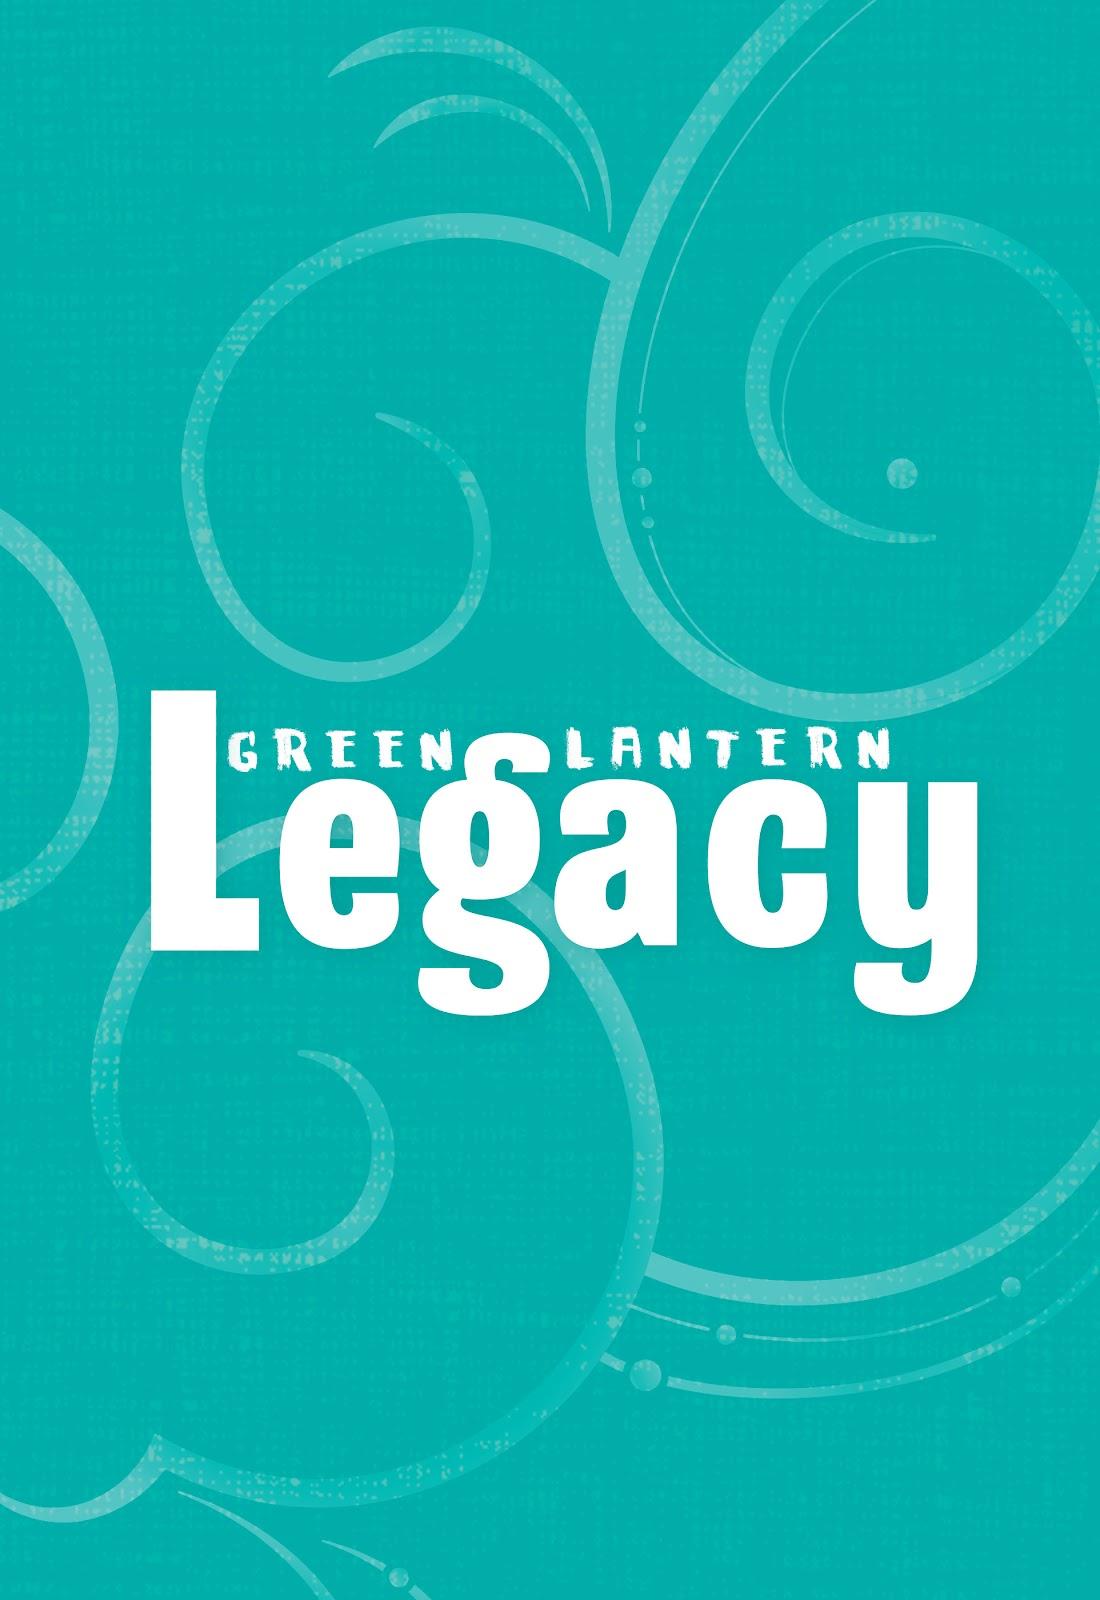 Read online Green Lantern: Legacy comic -  Issue # TPB - 2